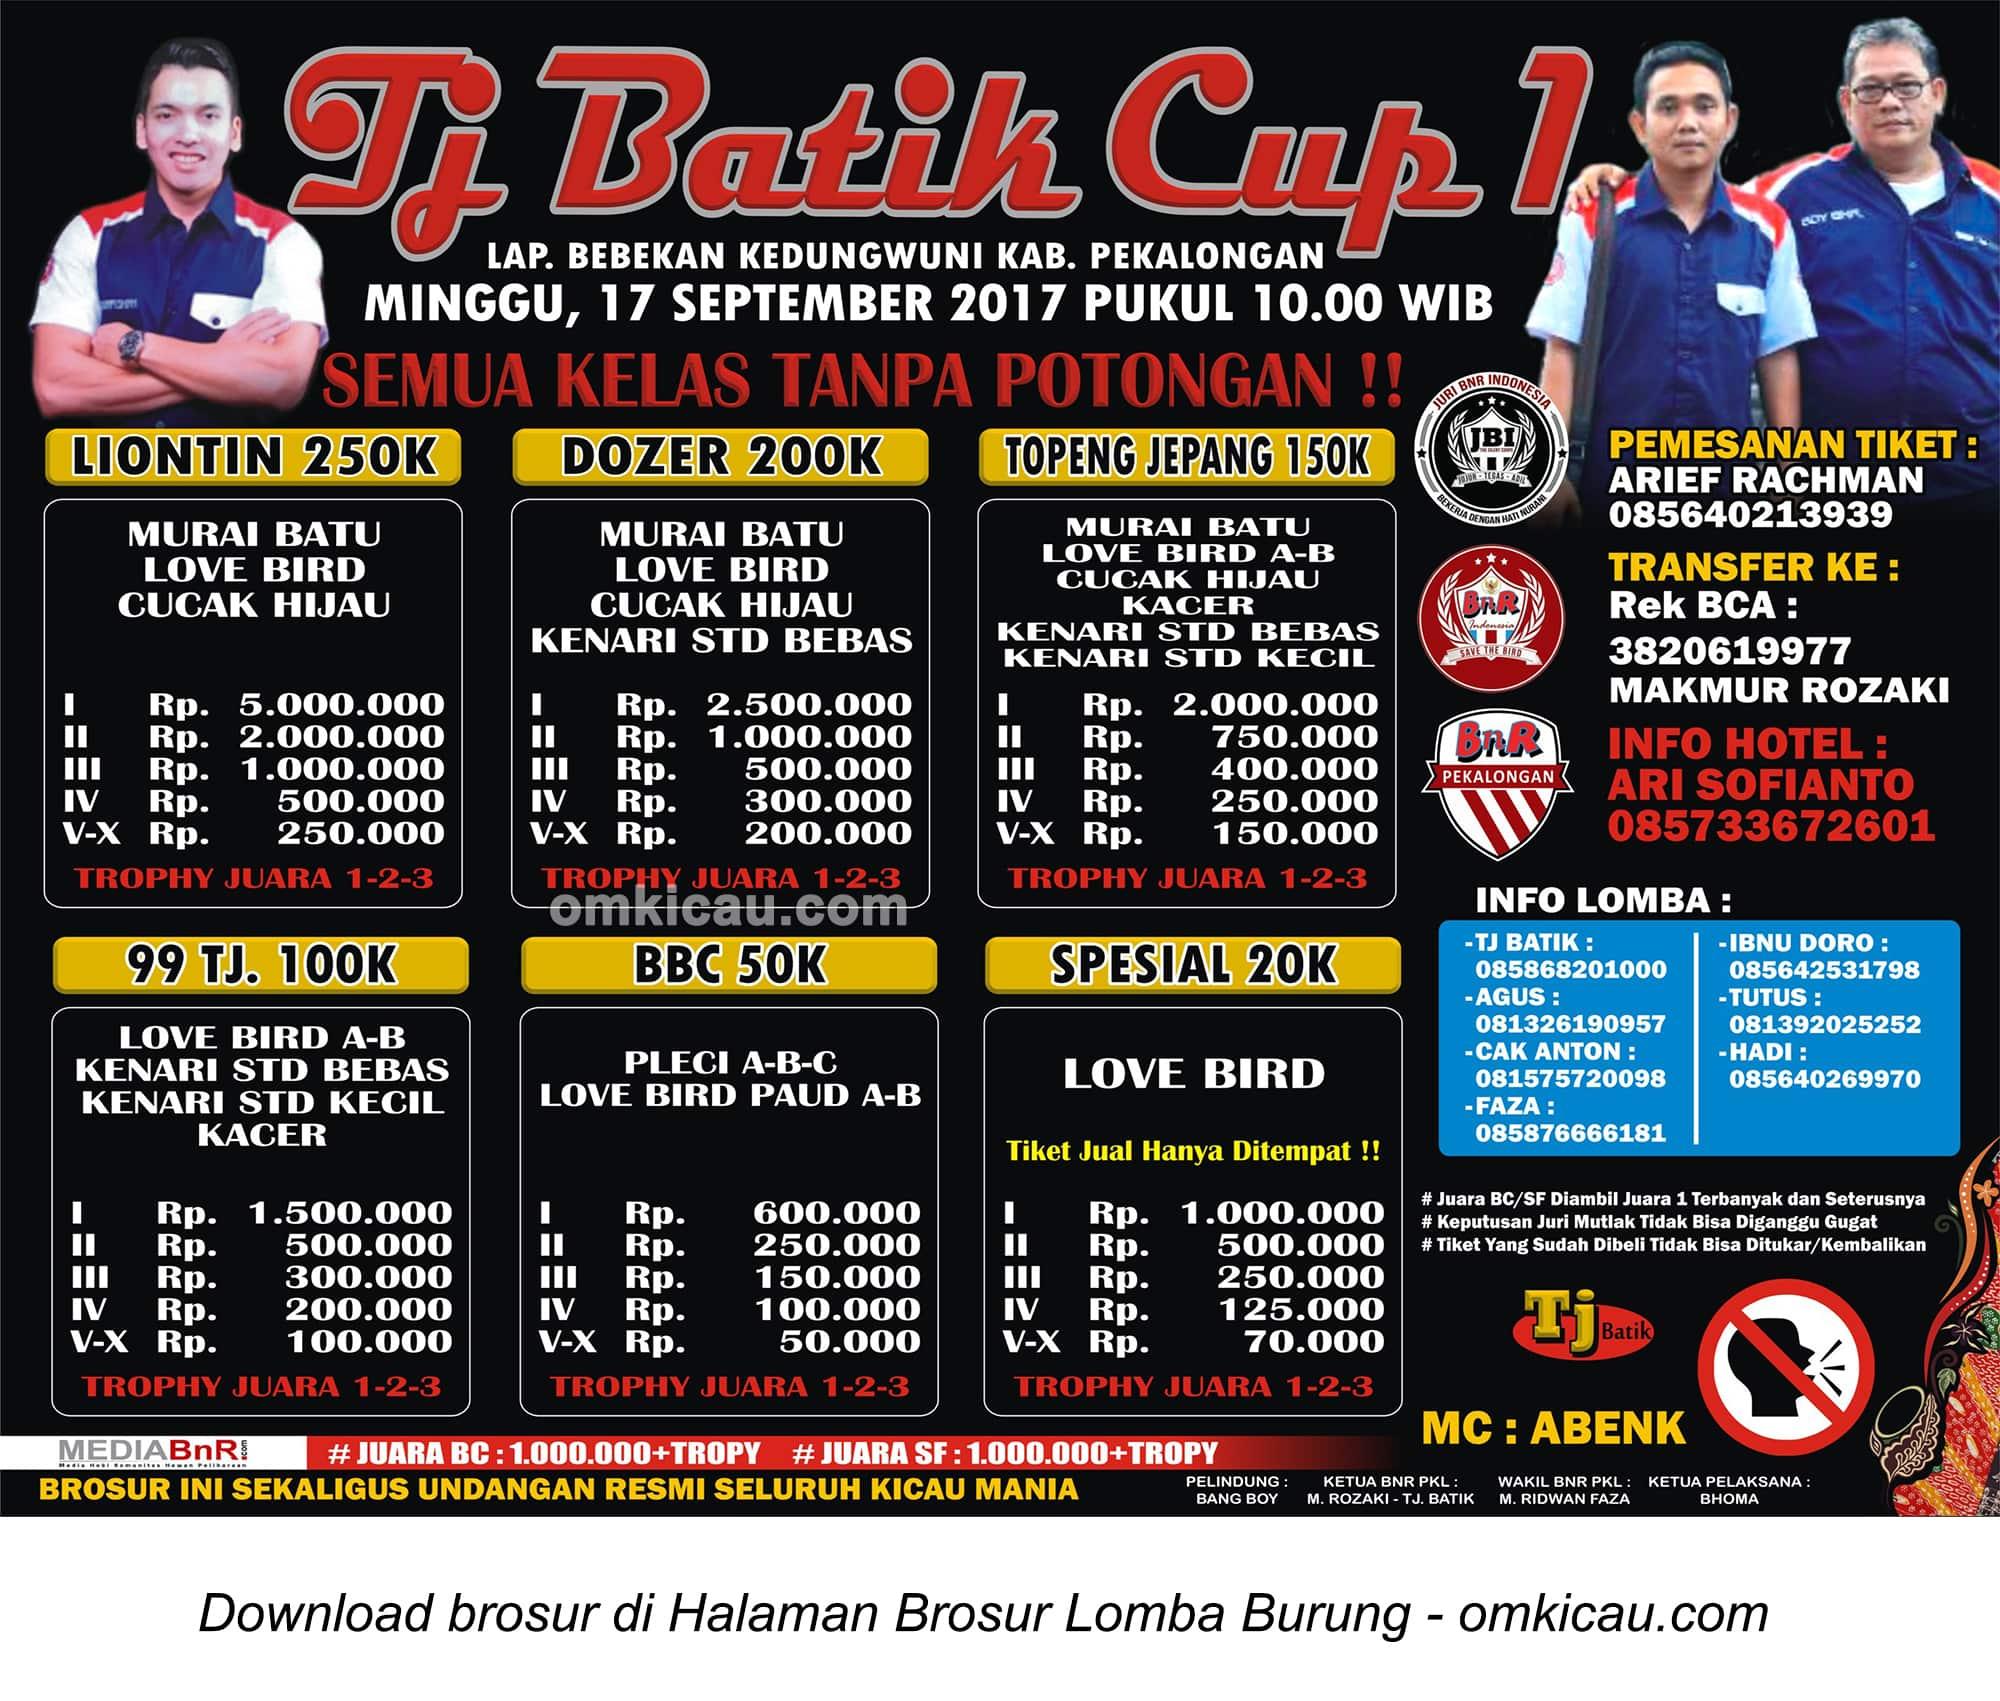 brosur tj batik cup 1